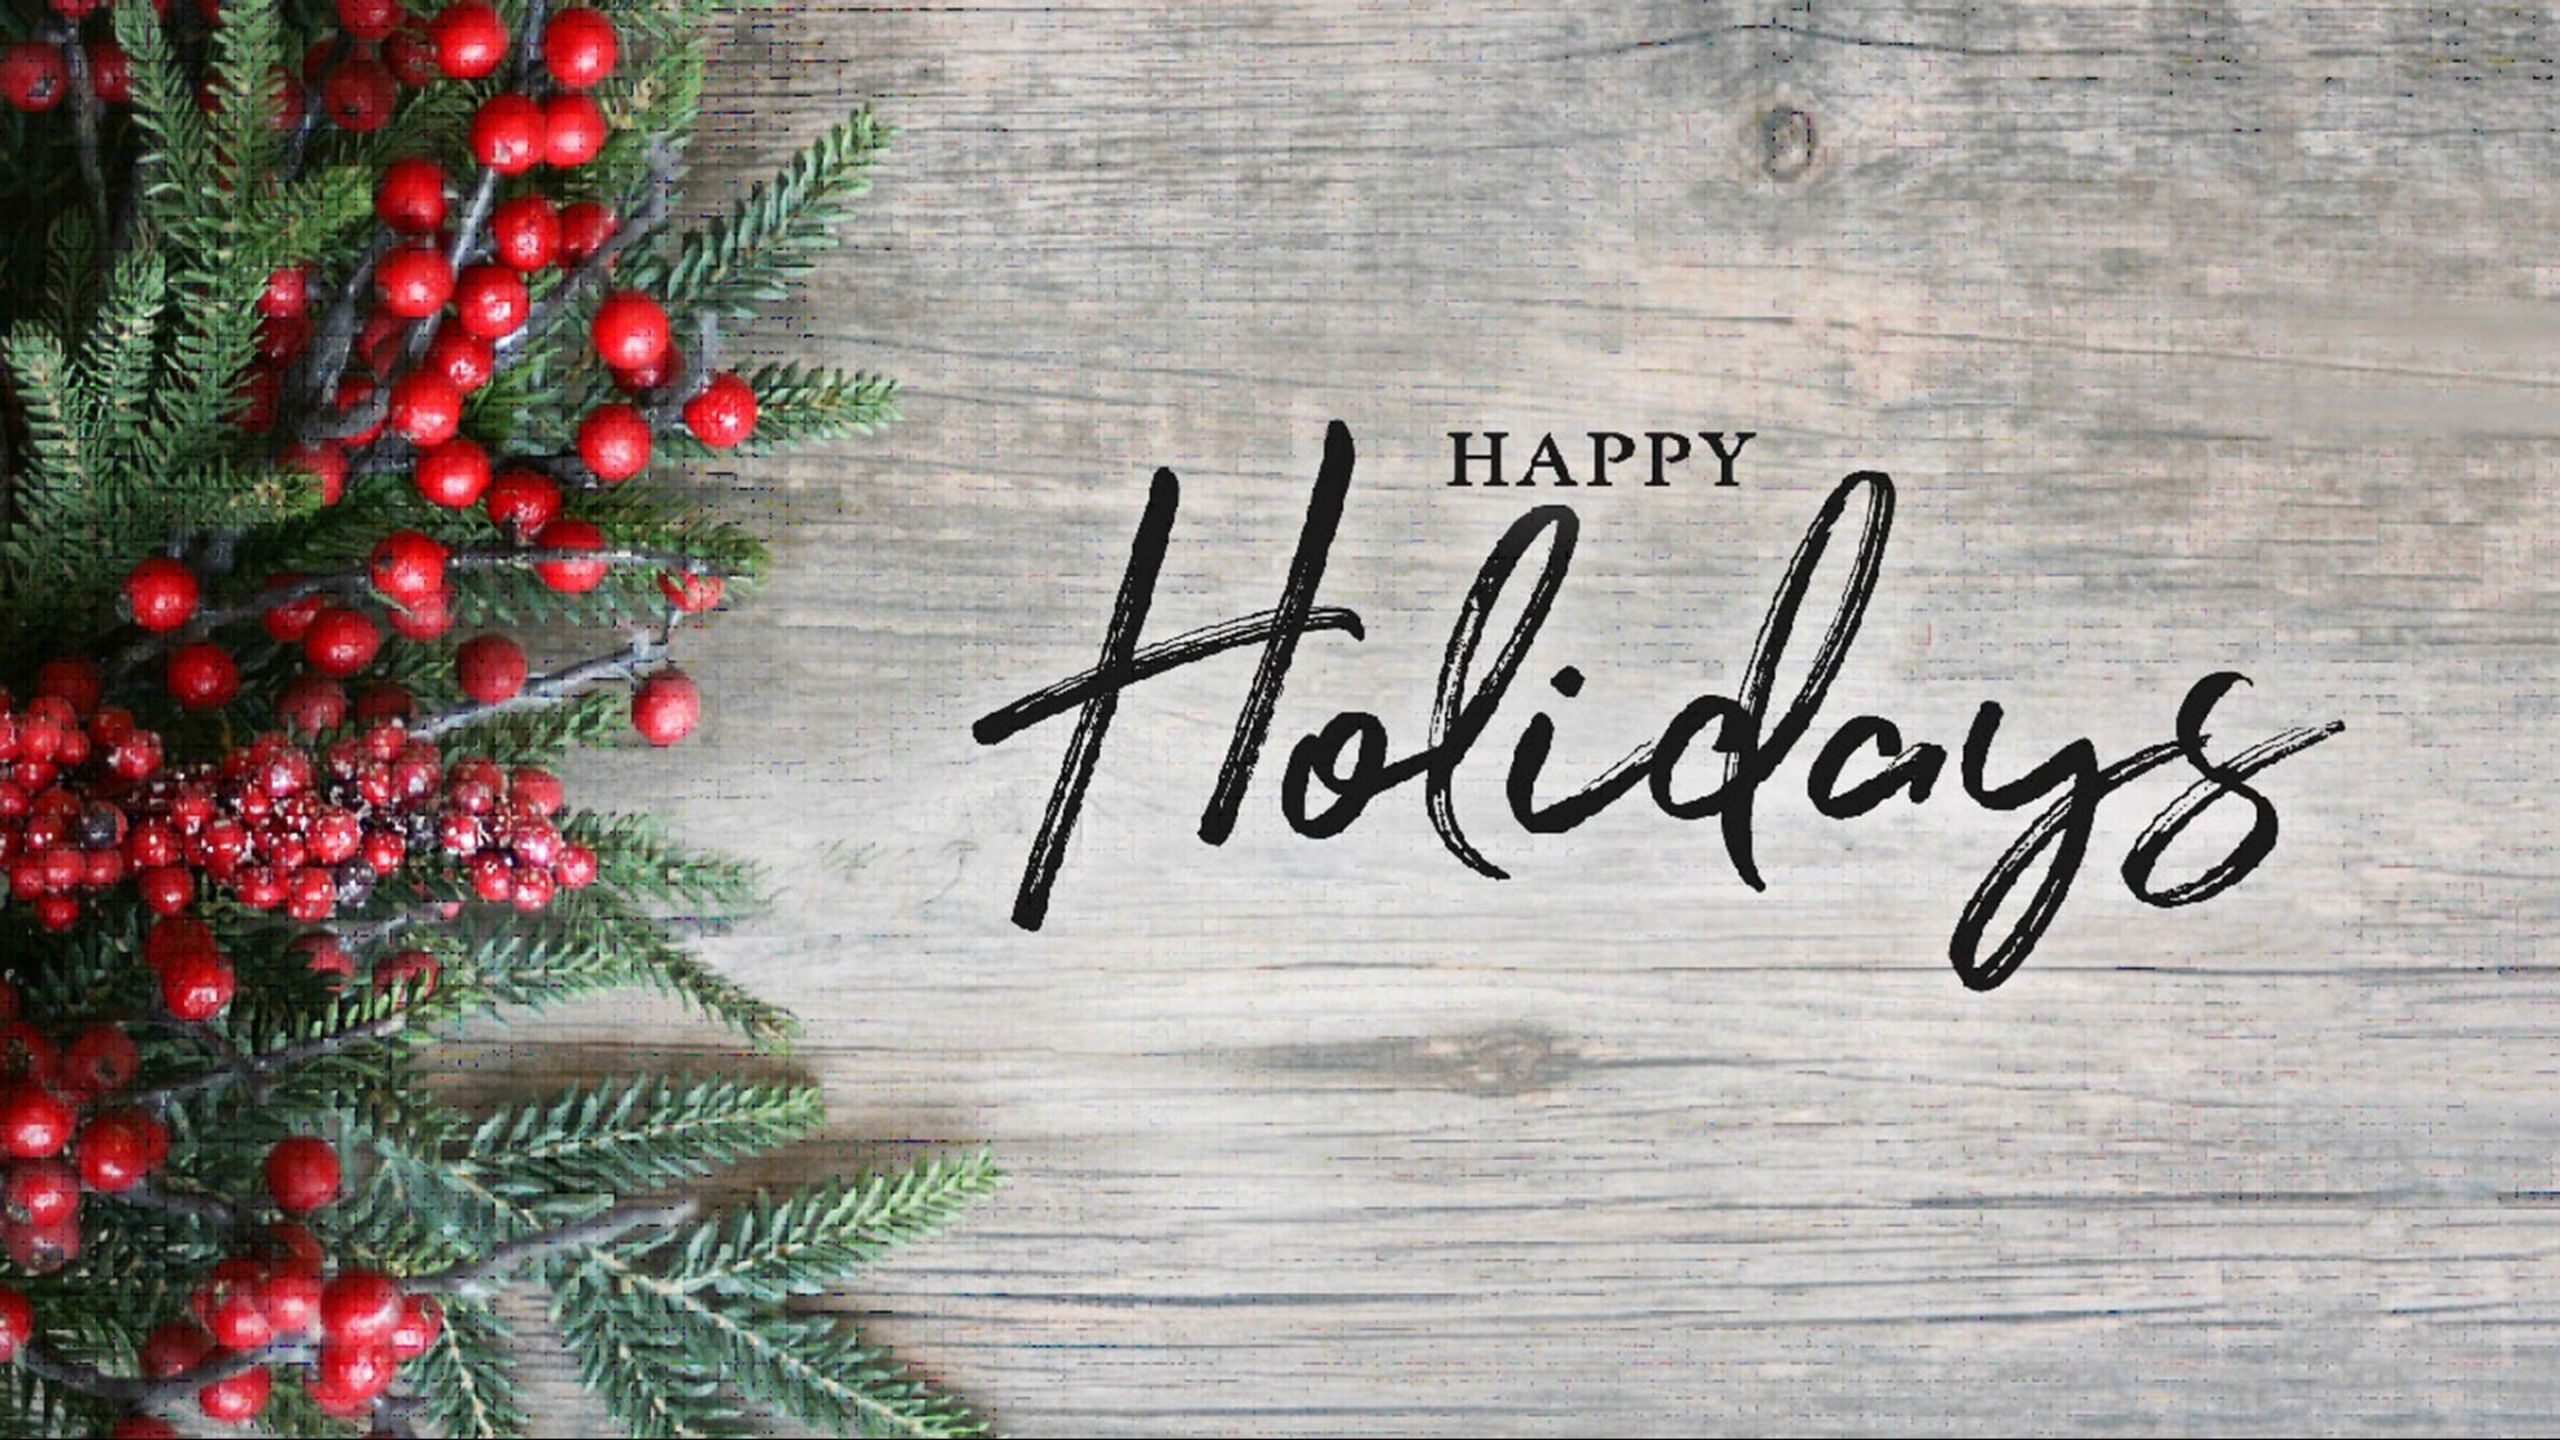 Wishing You Love and Joy This Holiday Season!